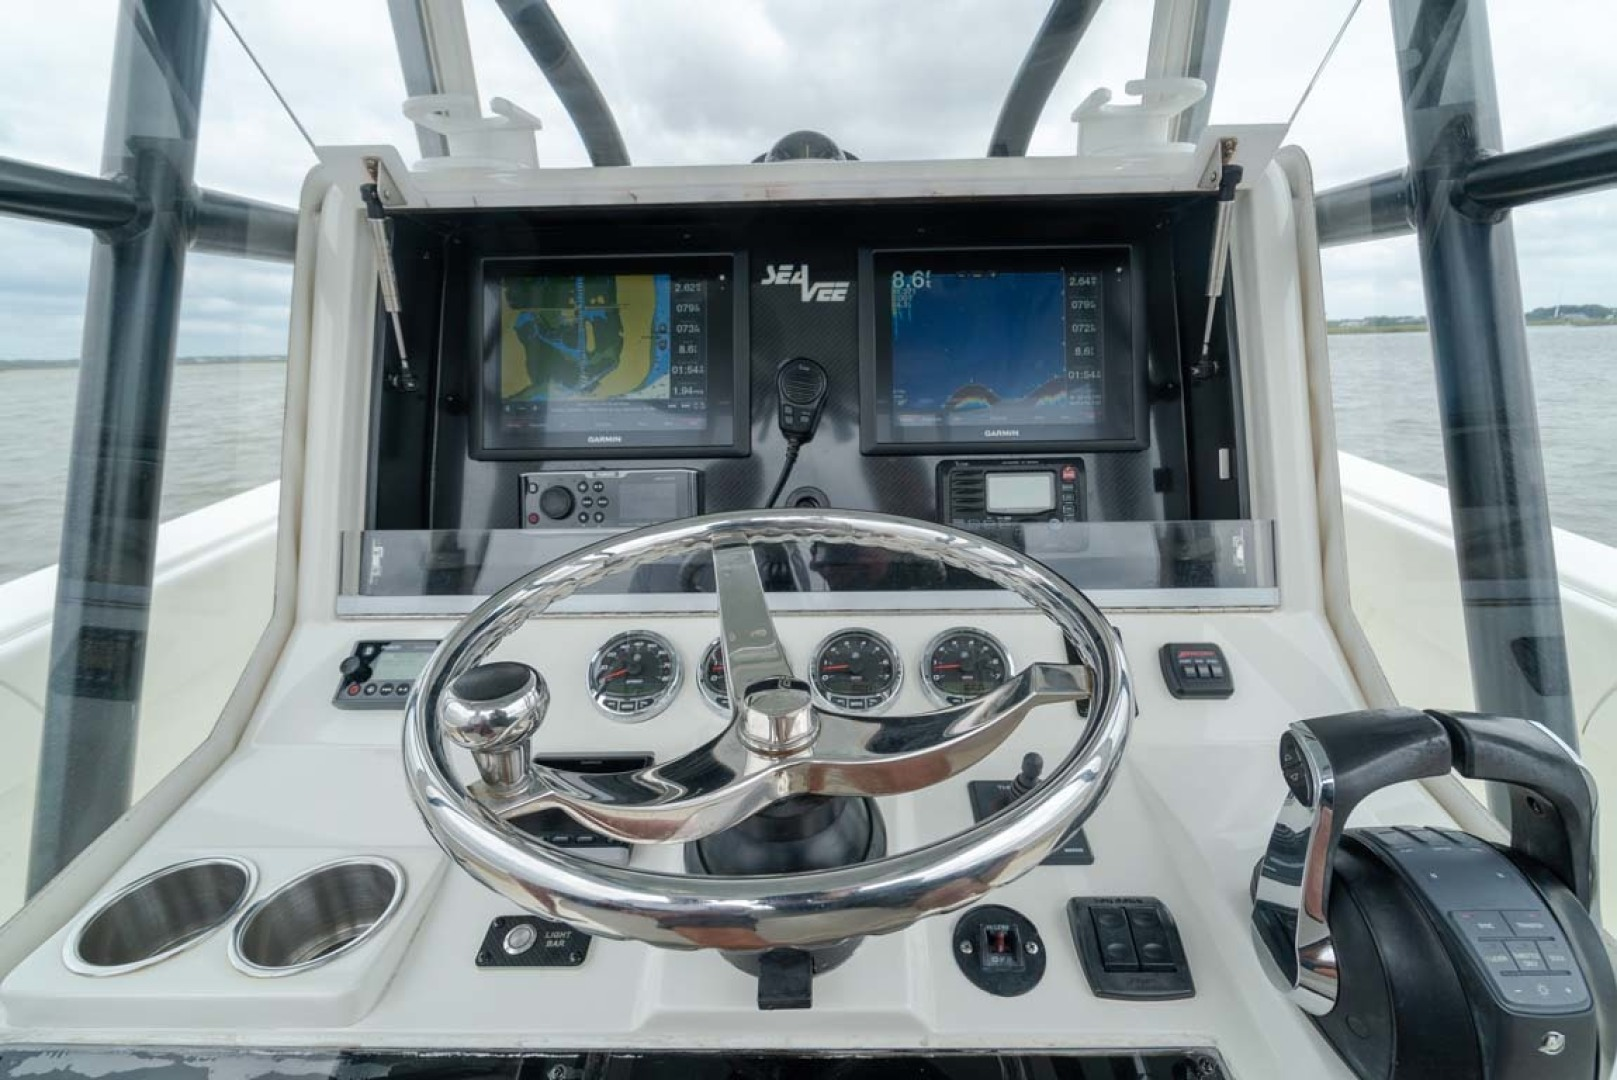 SeaVee-340 B Center Console 2014-Riff Raff Mount Pleasant-South Carolina-United States Helm-1509721 | Thumbnail